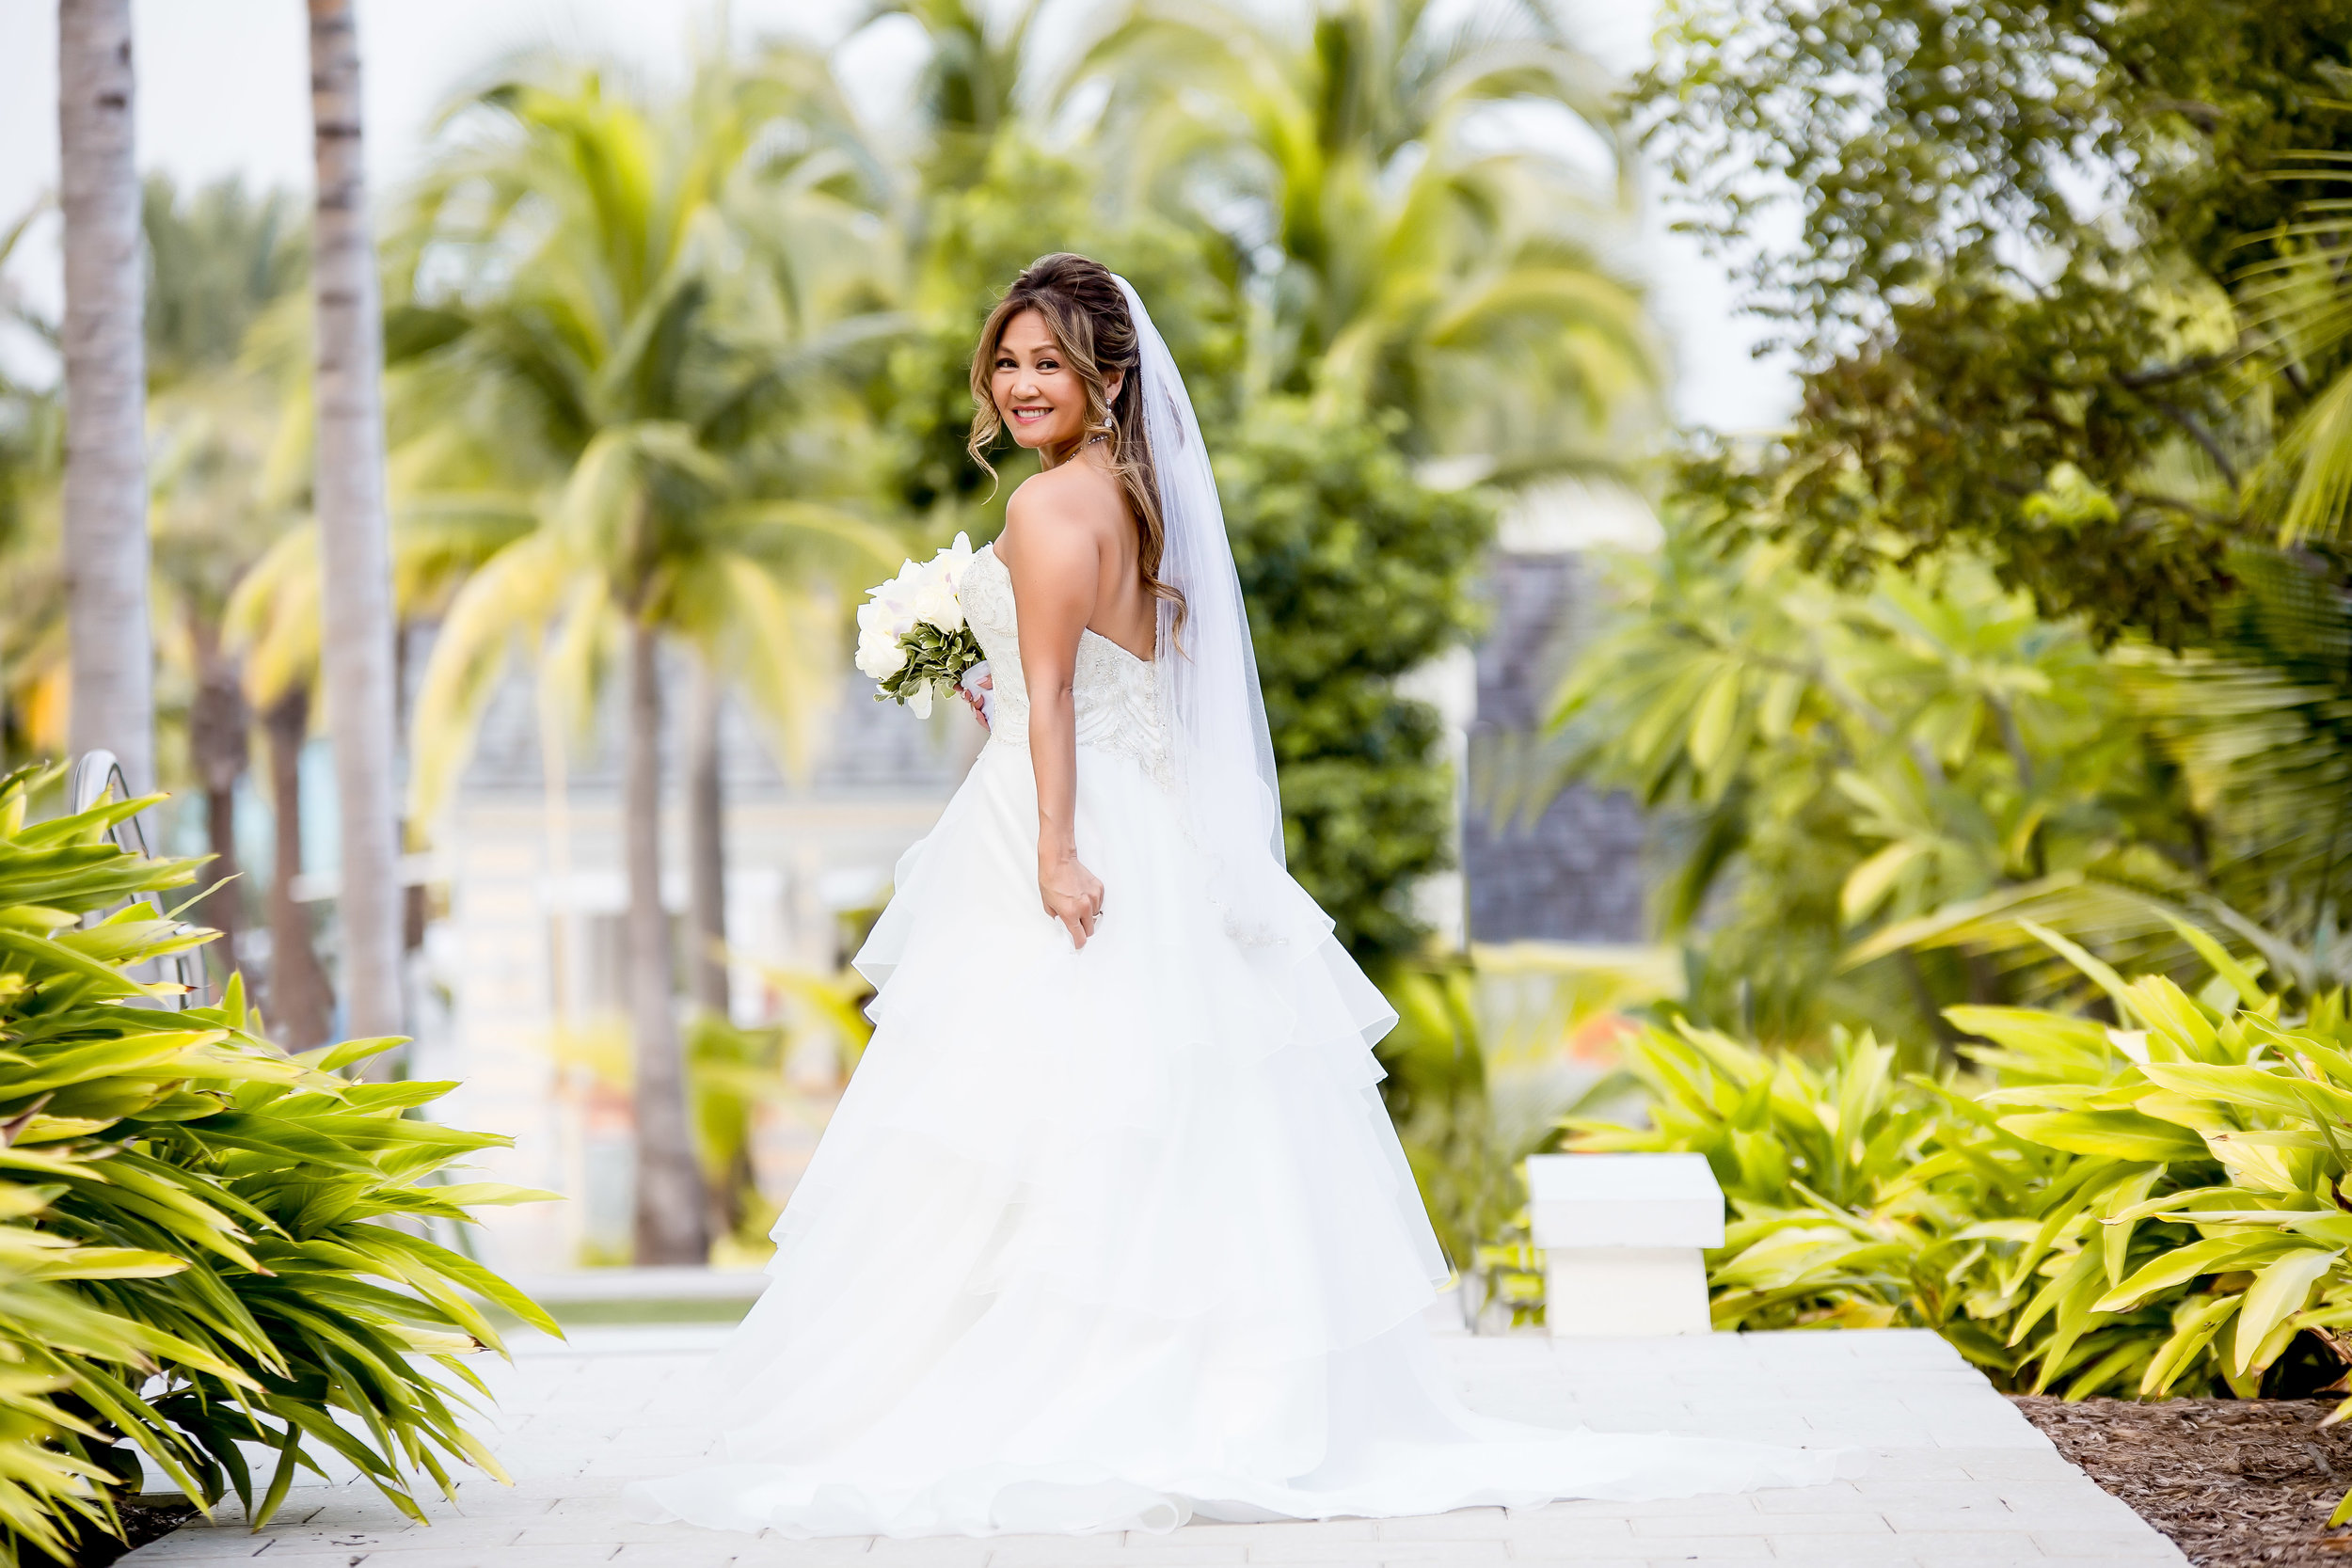 2017 Brides -1.jpg